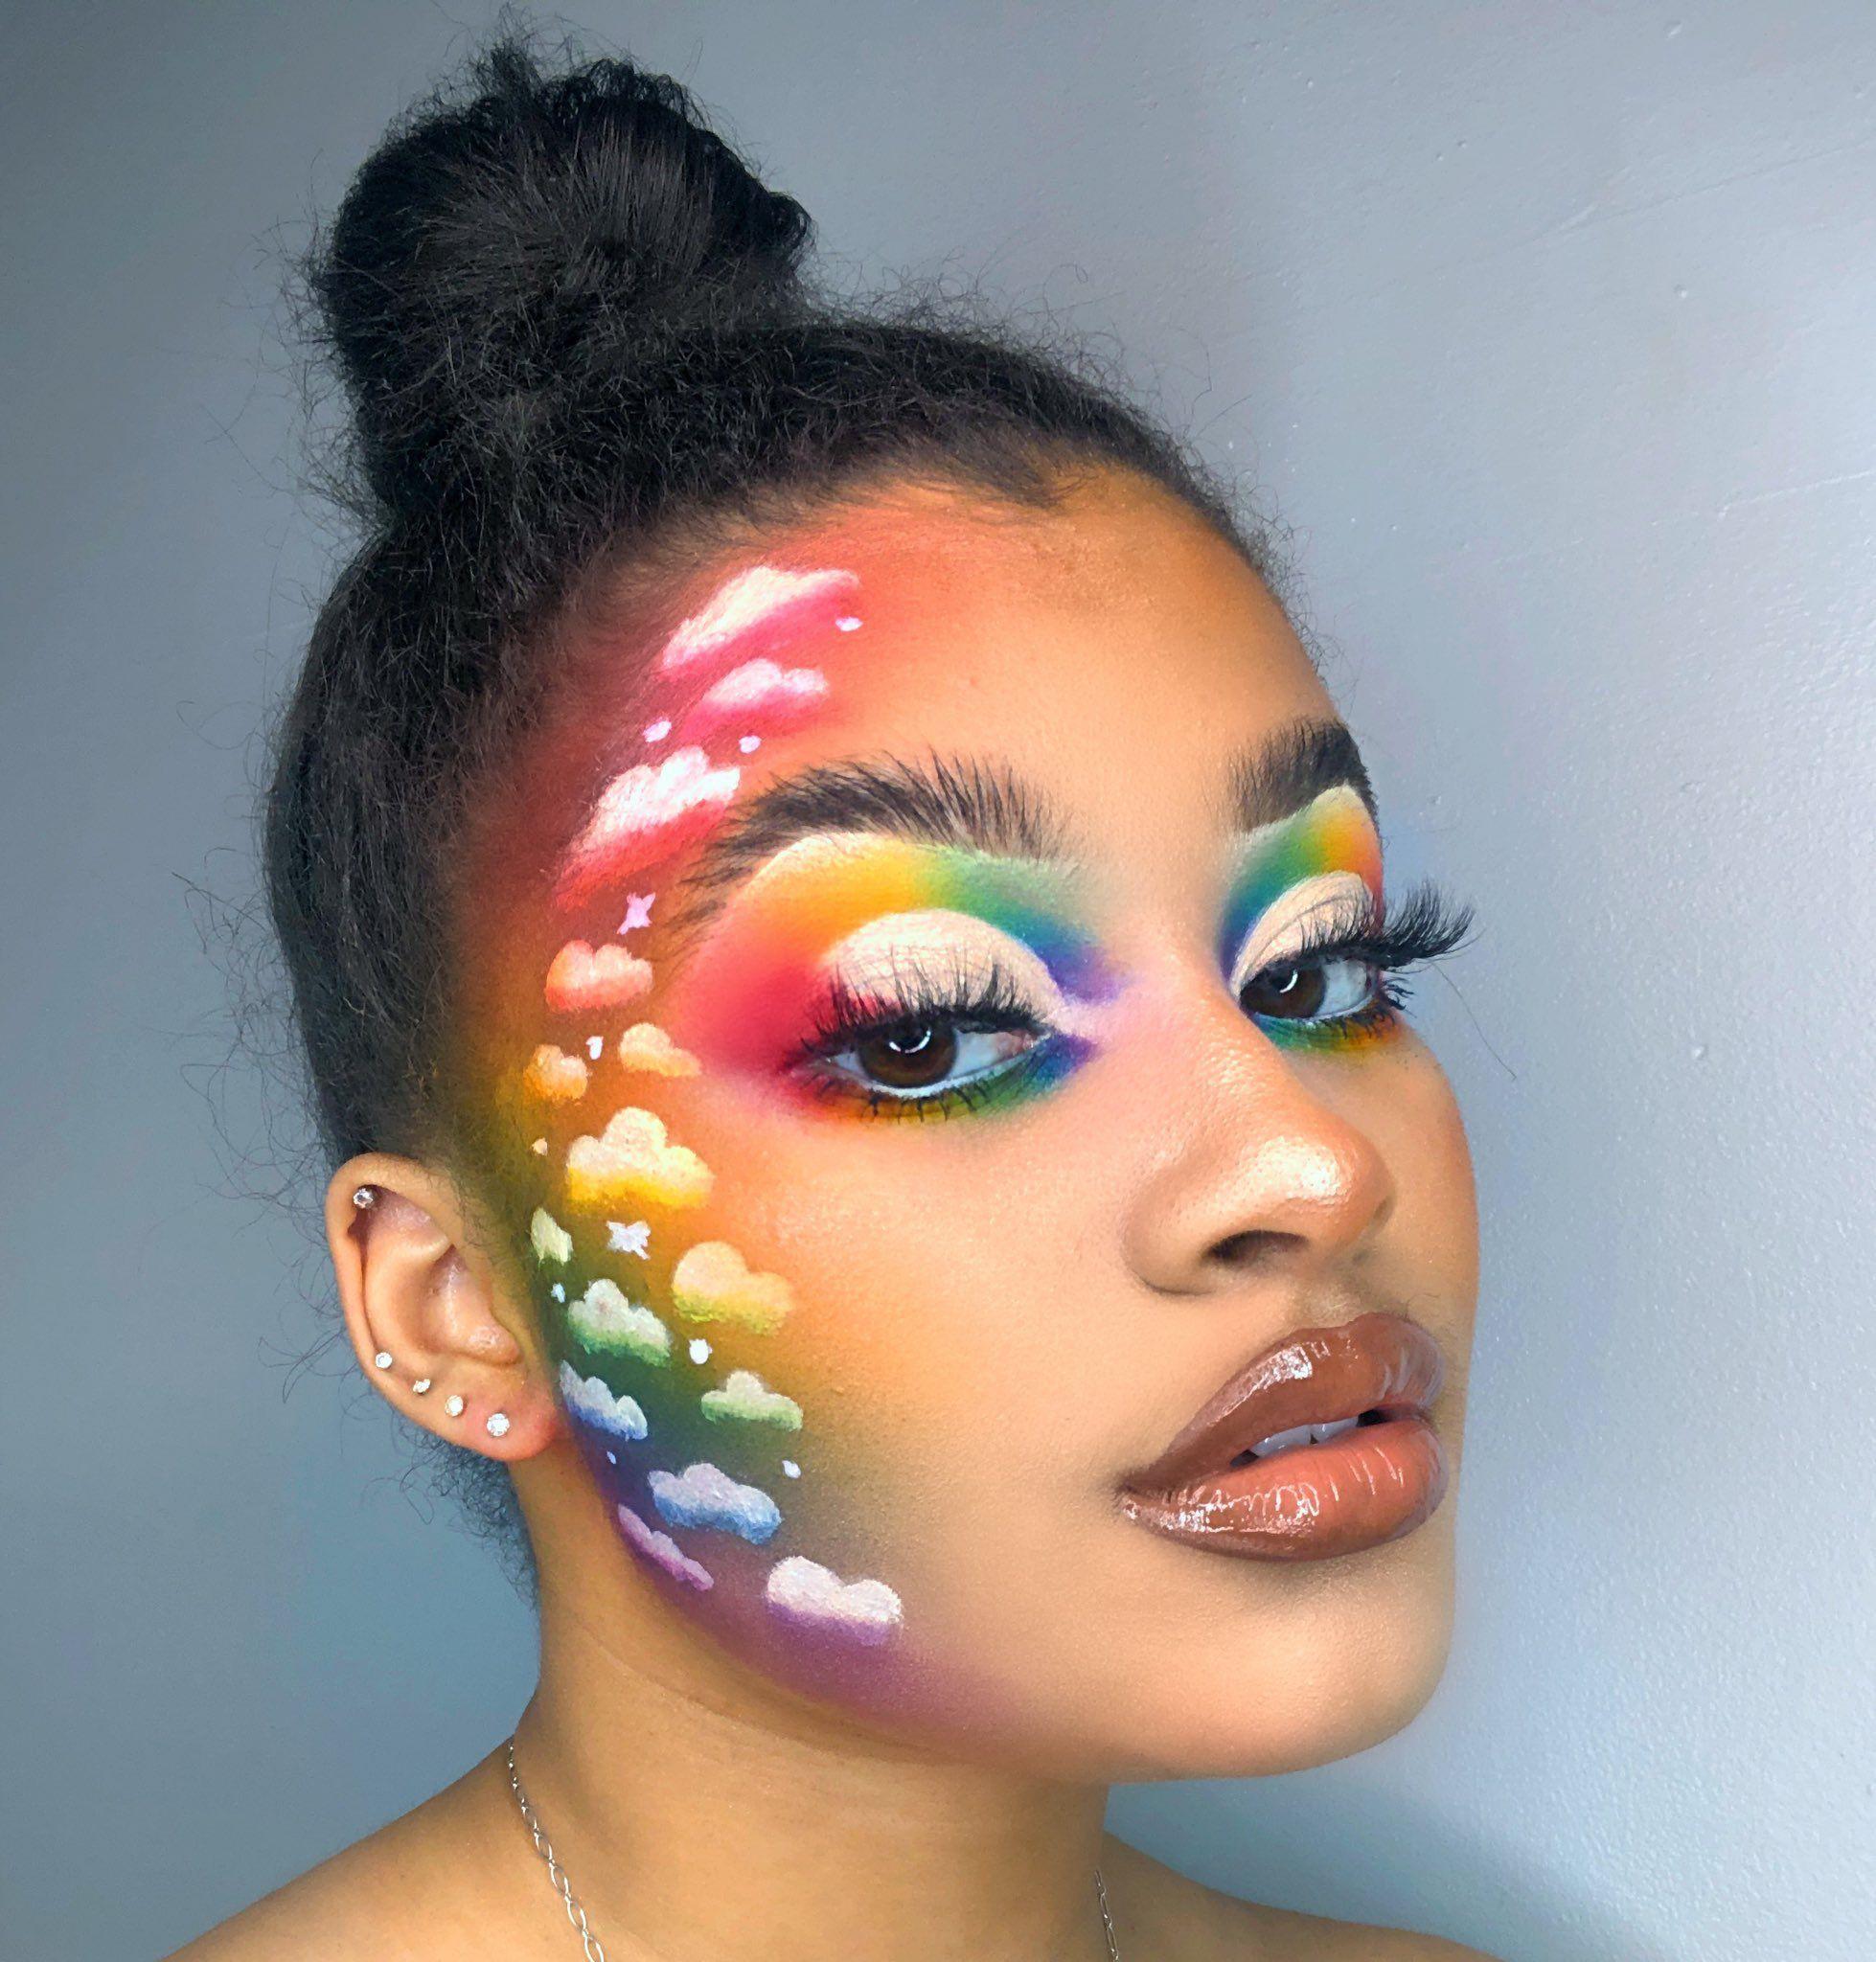 Pin by Melanie Abraham on MAKEUP in 2020 | Pride makeup ...